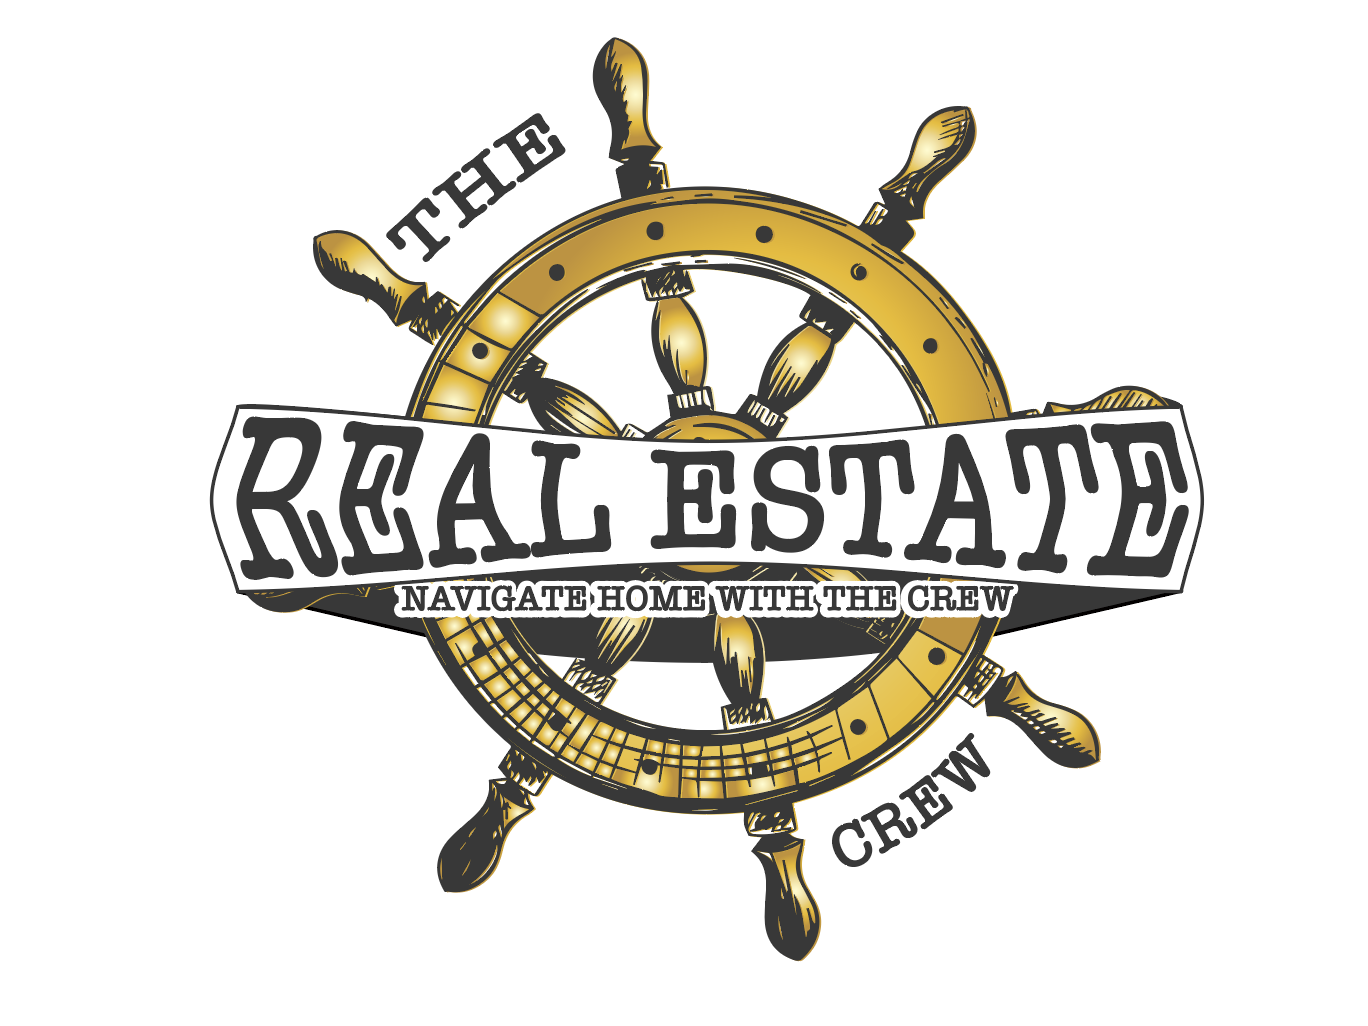 Real estate Crew logo concept luxury gold real estate logo design navy ship wheel ship vintage old classic branding design logo illustration creative vector